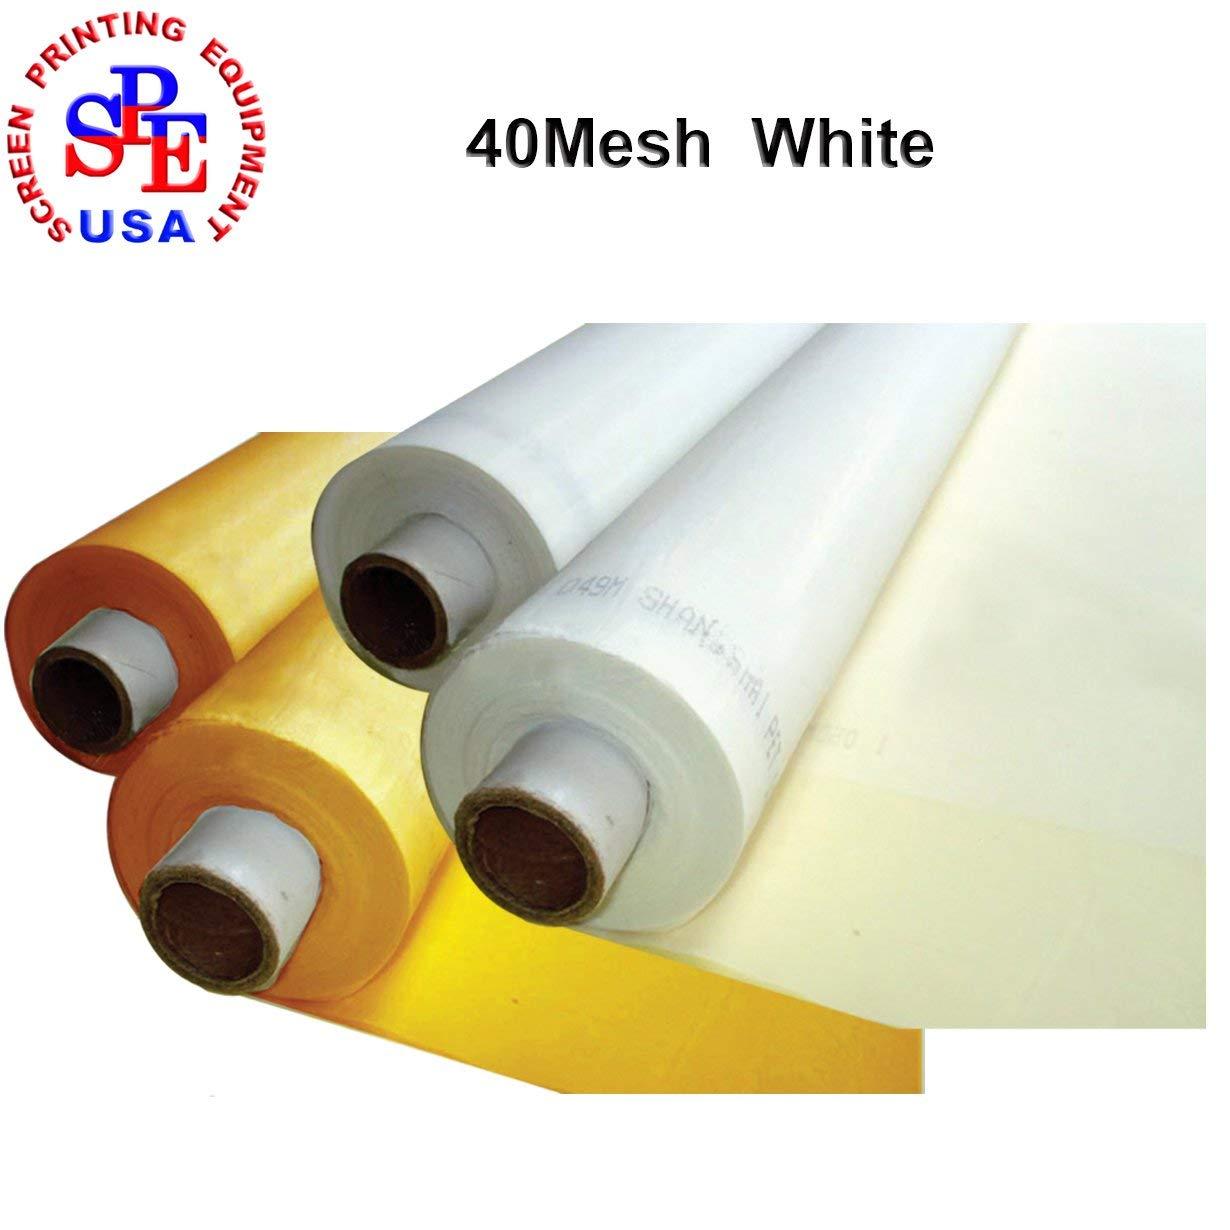 1 Yard 40/60/80/100/110/120/140/160/180/200/250/300Mesh 50Inches Width Silk Screen Fabric (40Mesh (16T) White)